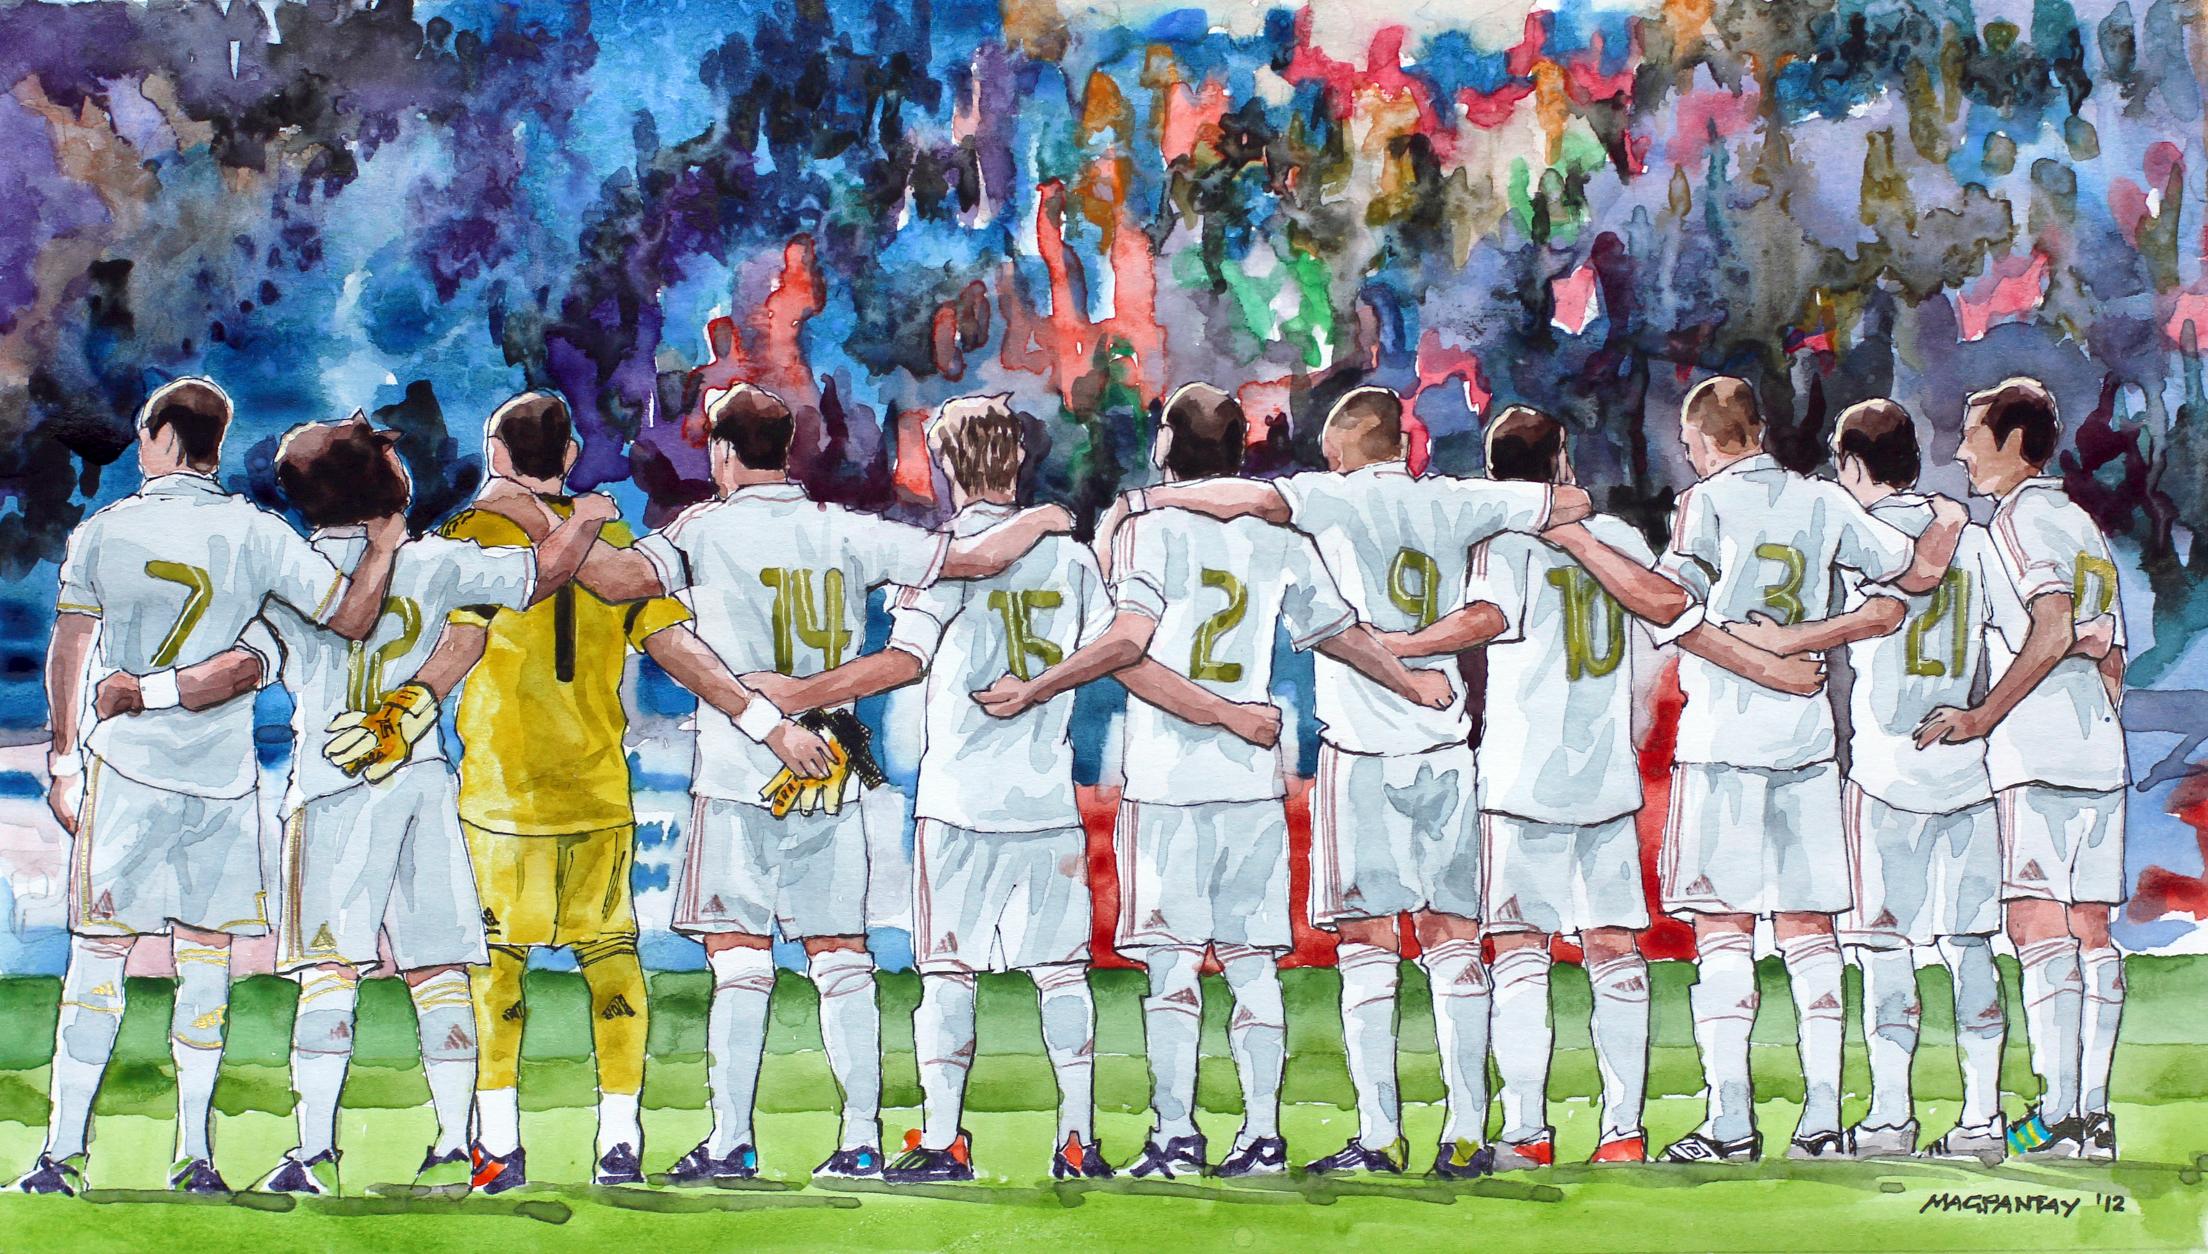 Mannschaft, Elfmeter, Real Madrid, Einheit, Kollektiv